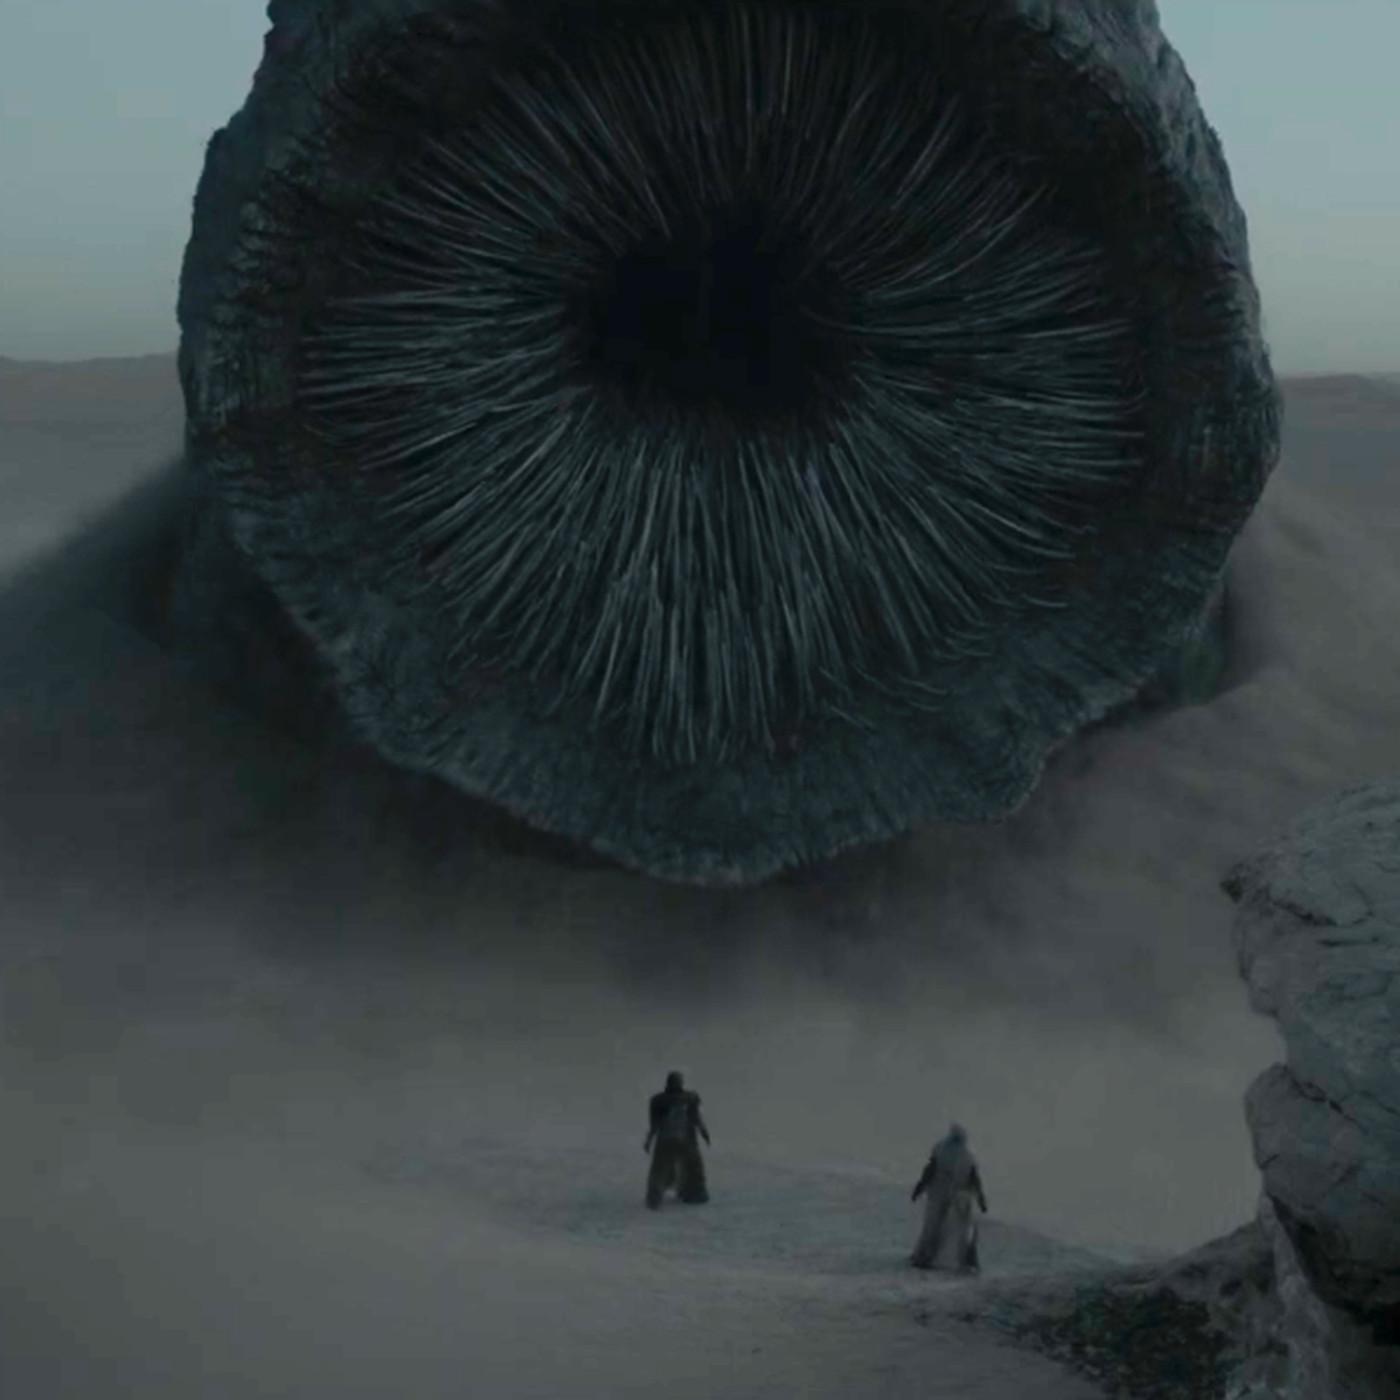 Dune: The giant sandworm, explained - Polygon